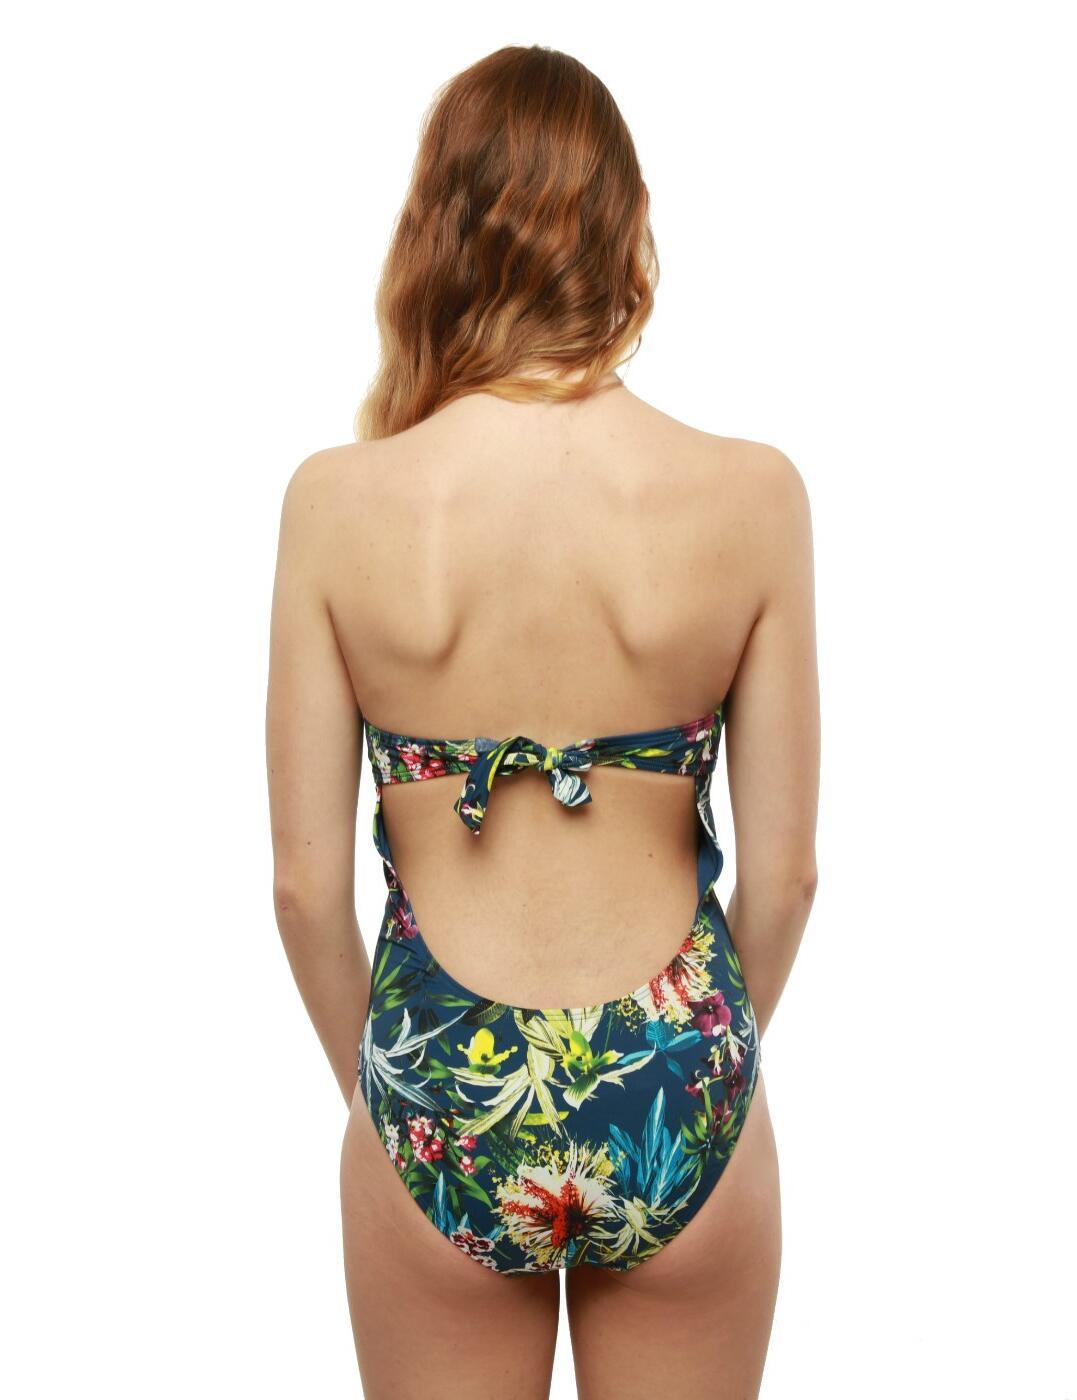 Moontide Botanical Twist Back Tie Twist Swimsuit Swimming Costume M4414BT